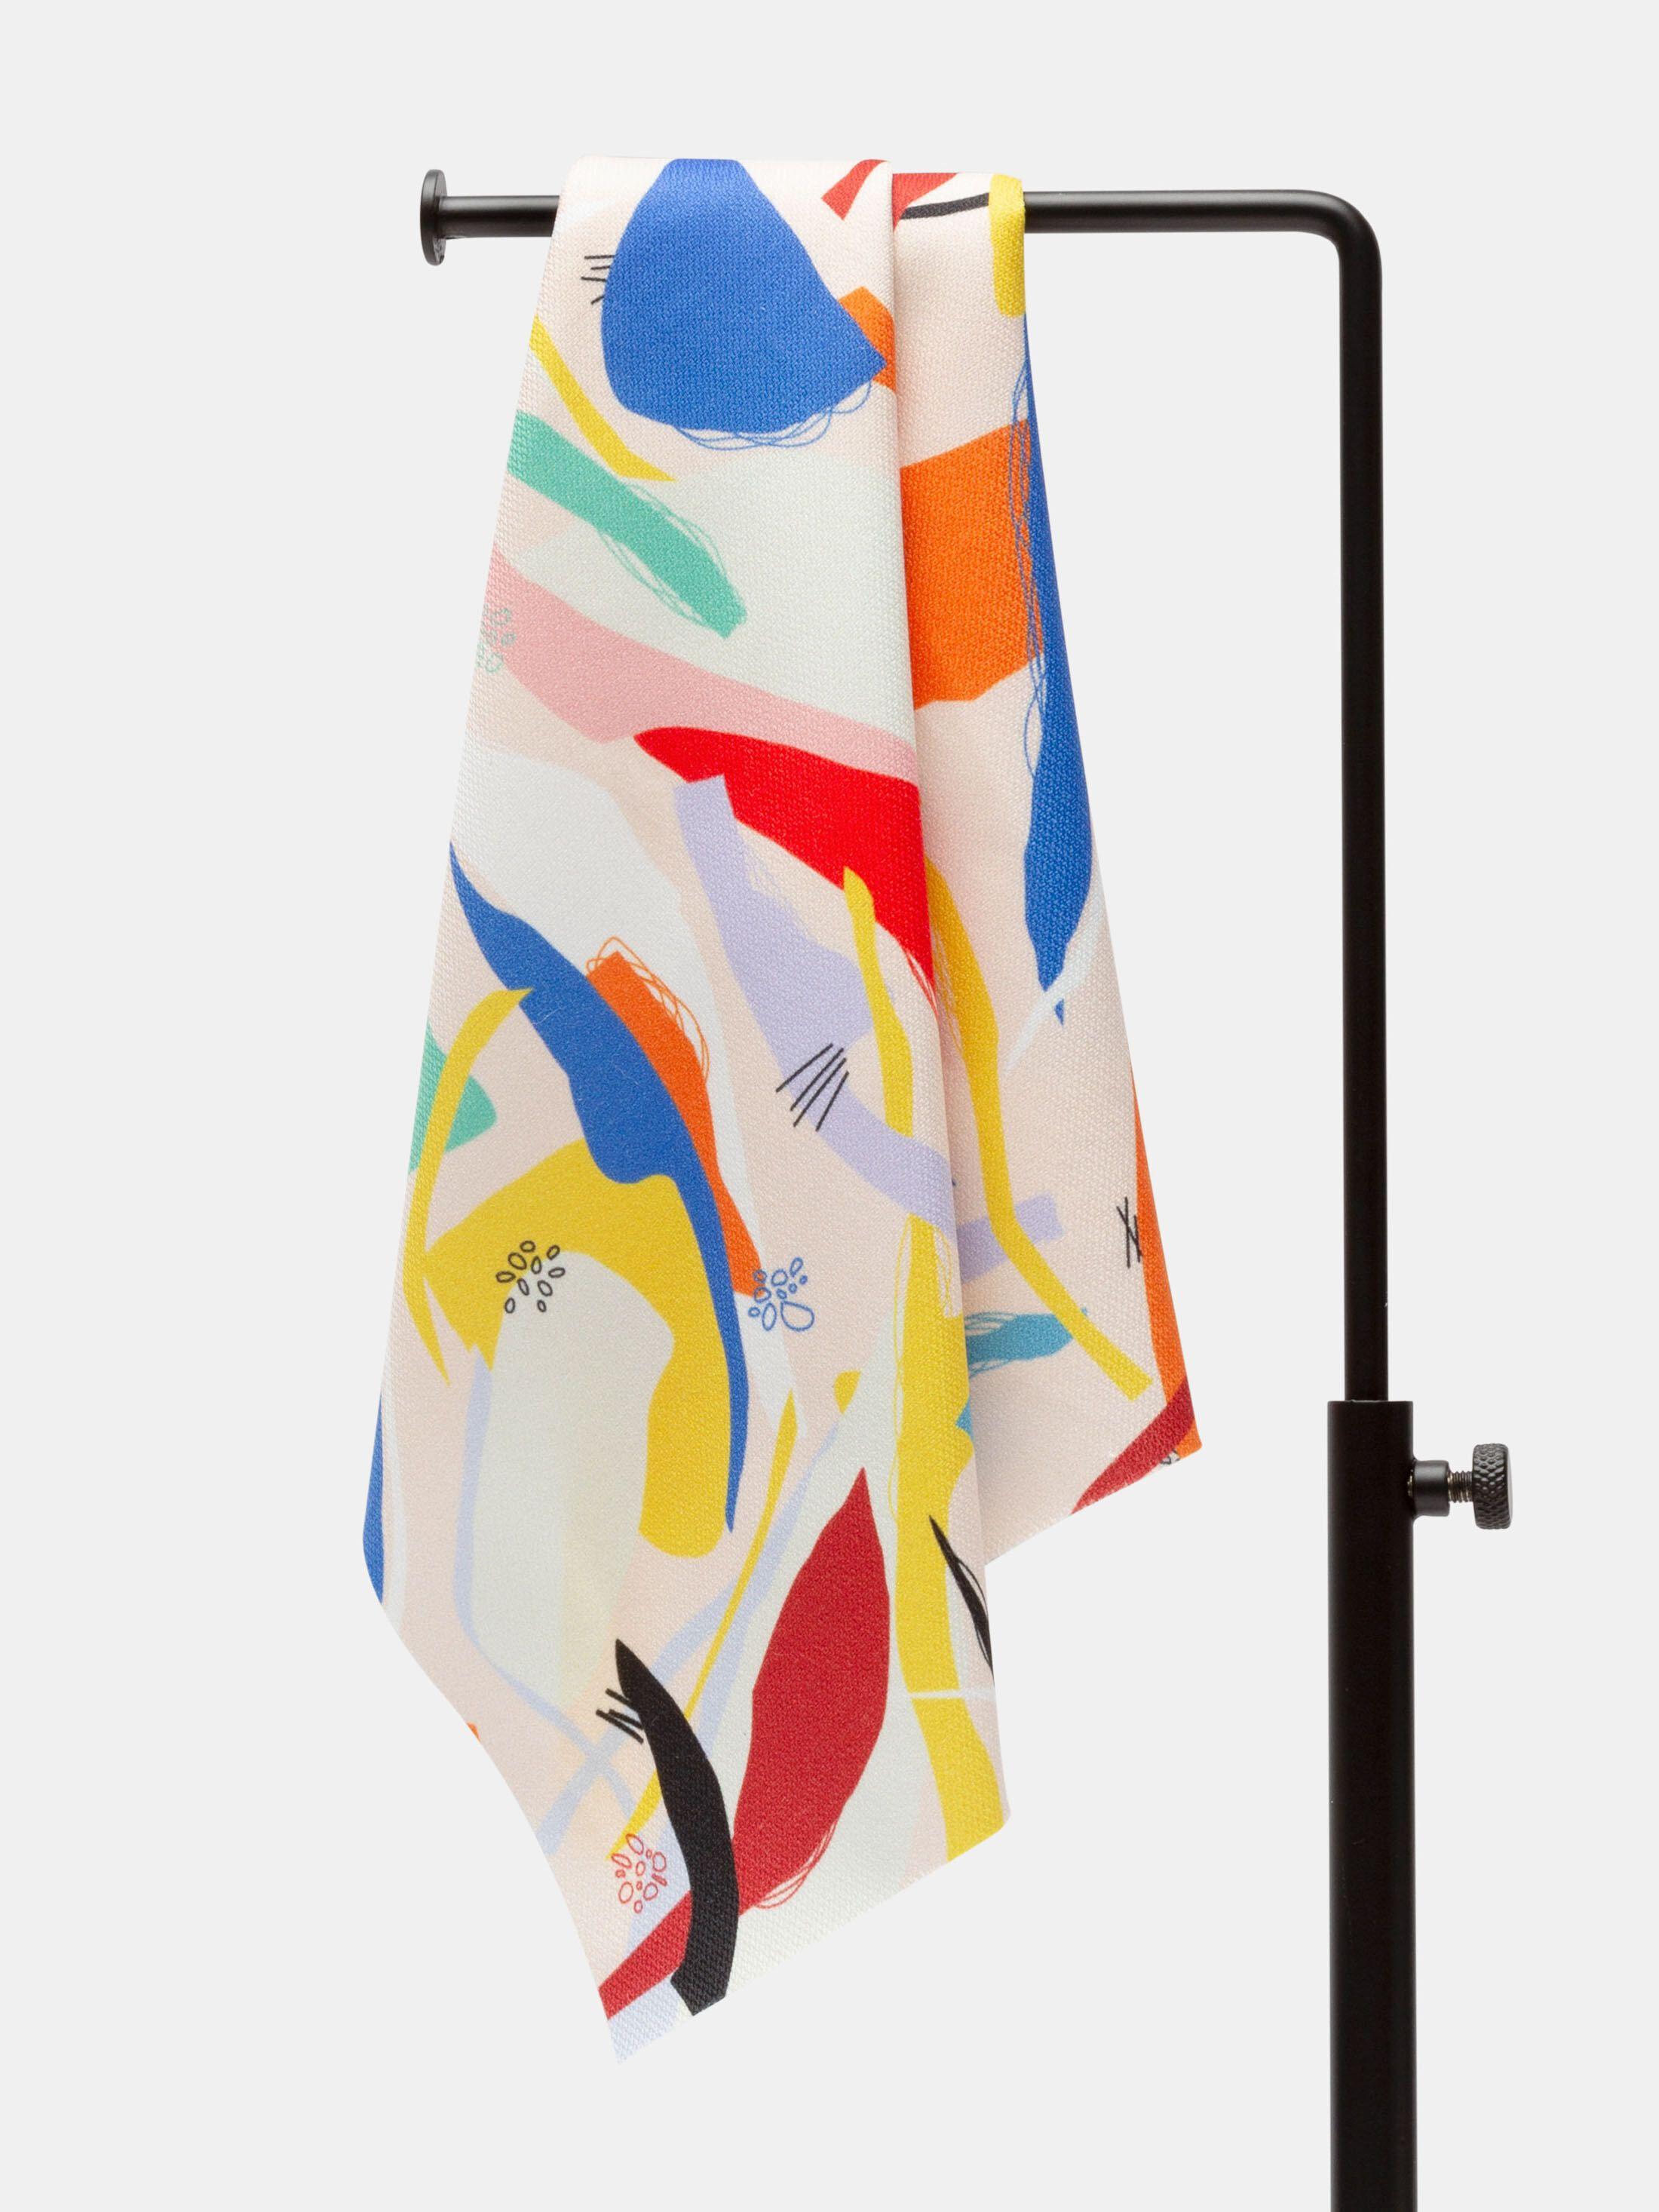 printing Lima Cotton Twill fabric